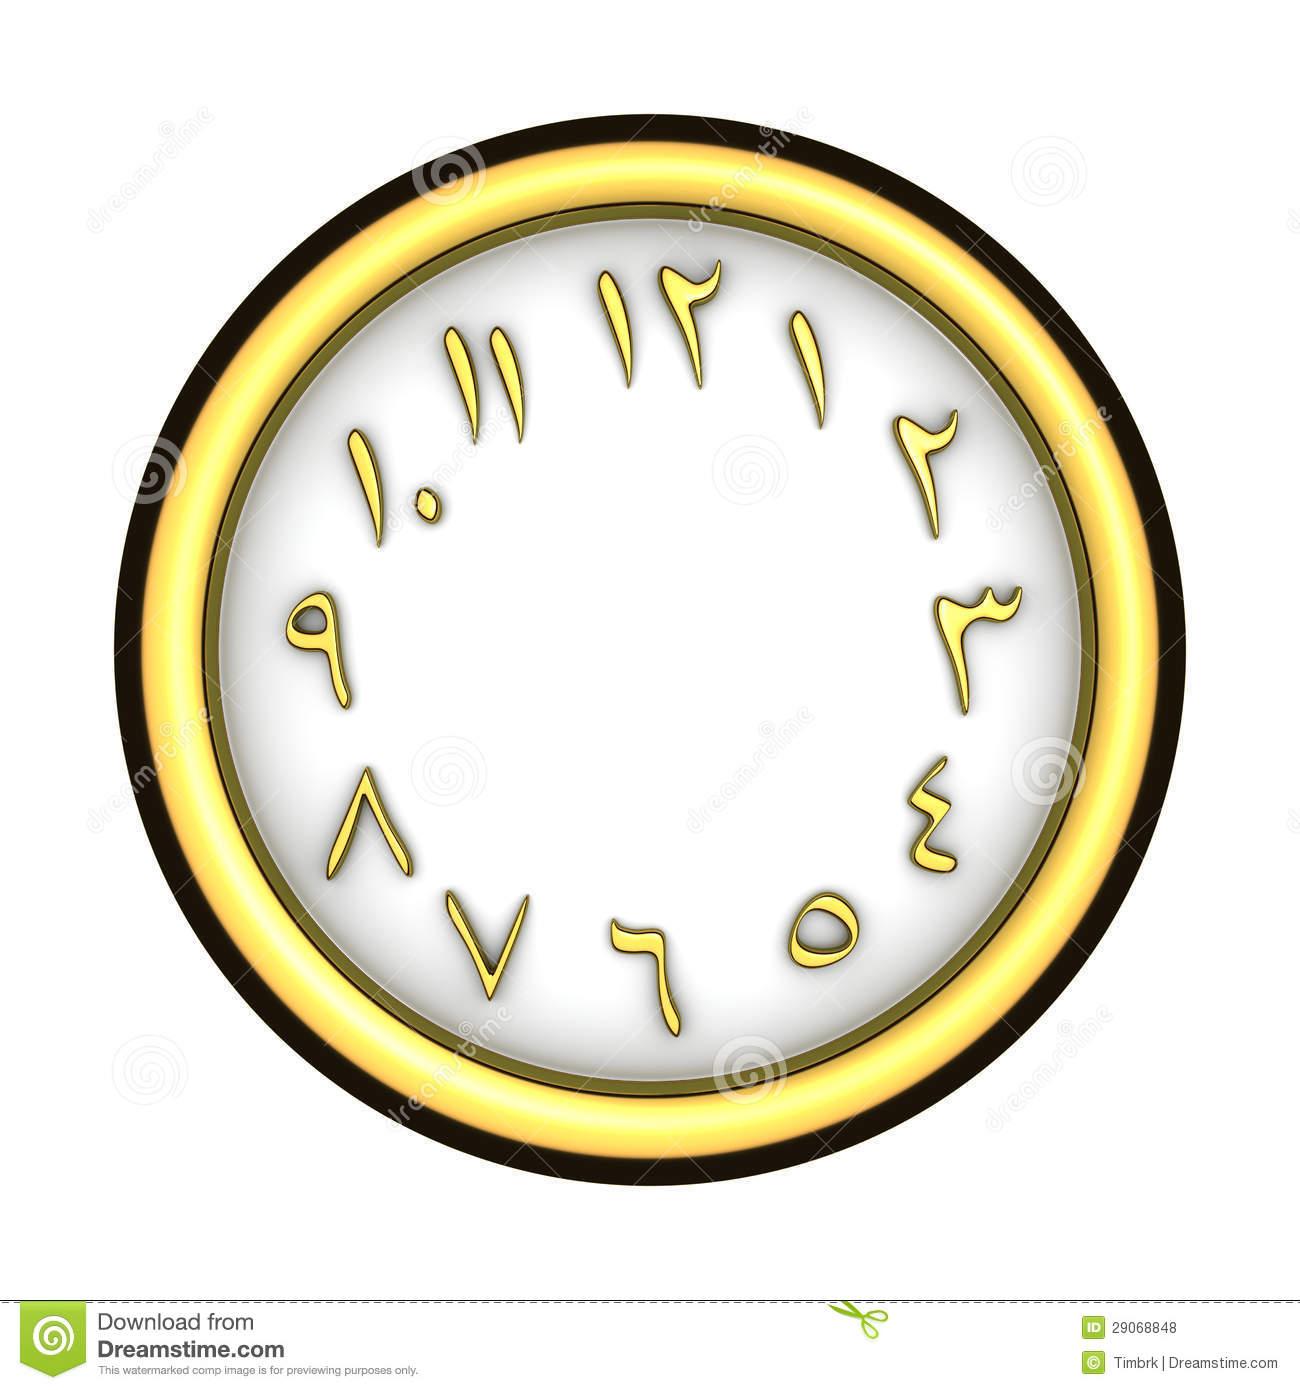 Clipart arabic clock jpg royalty free stock Clipart arabic clock - ClipartFest jpg royalty free stock